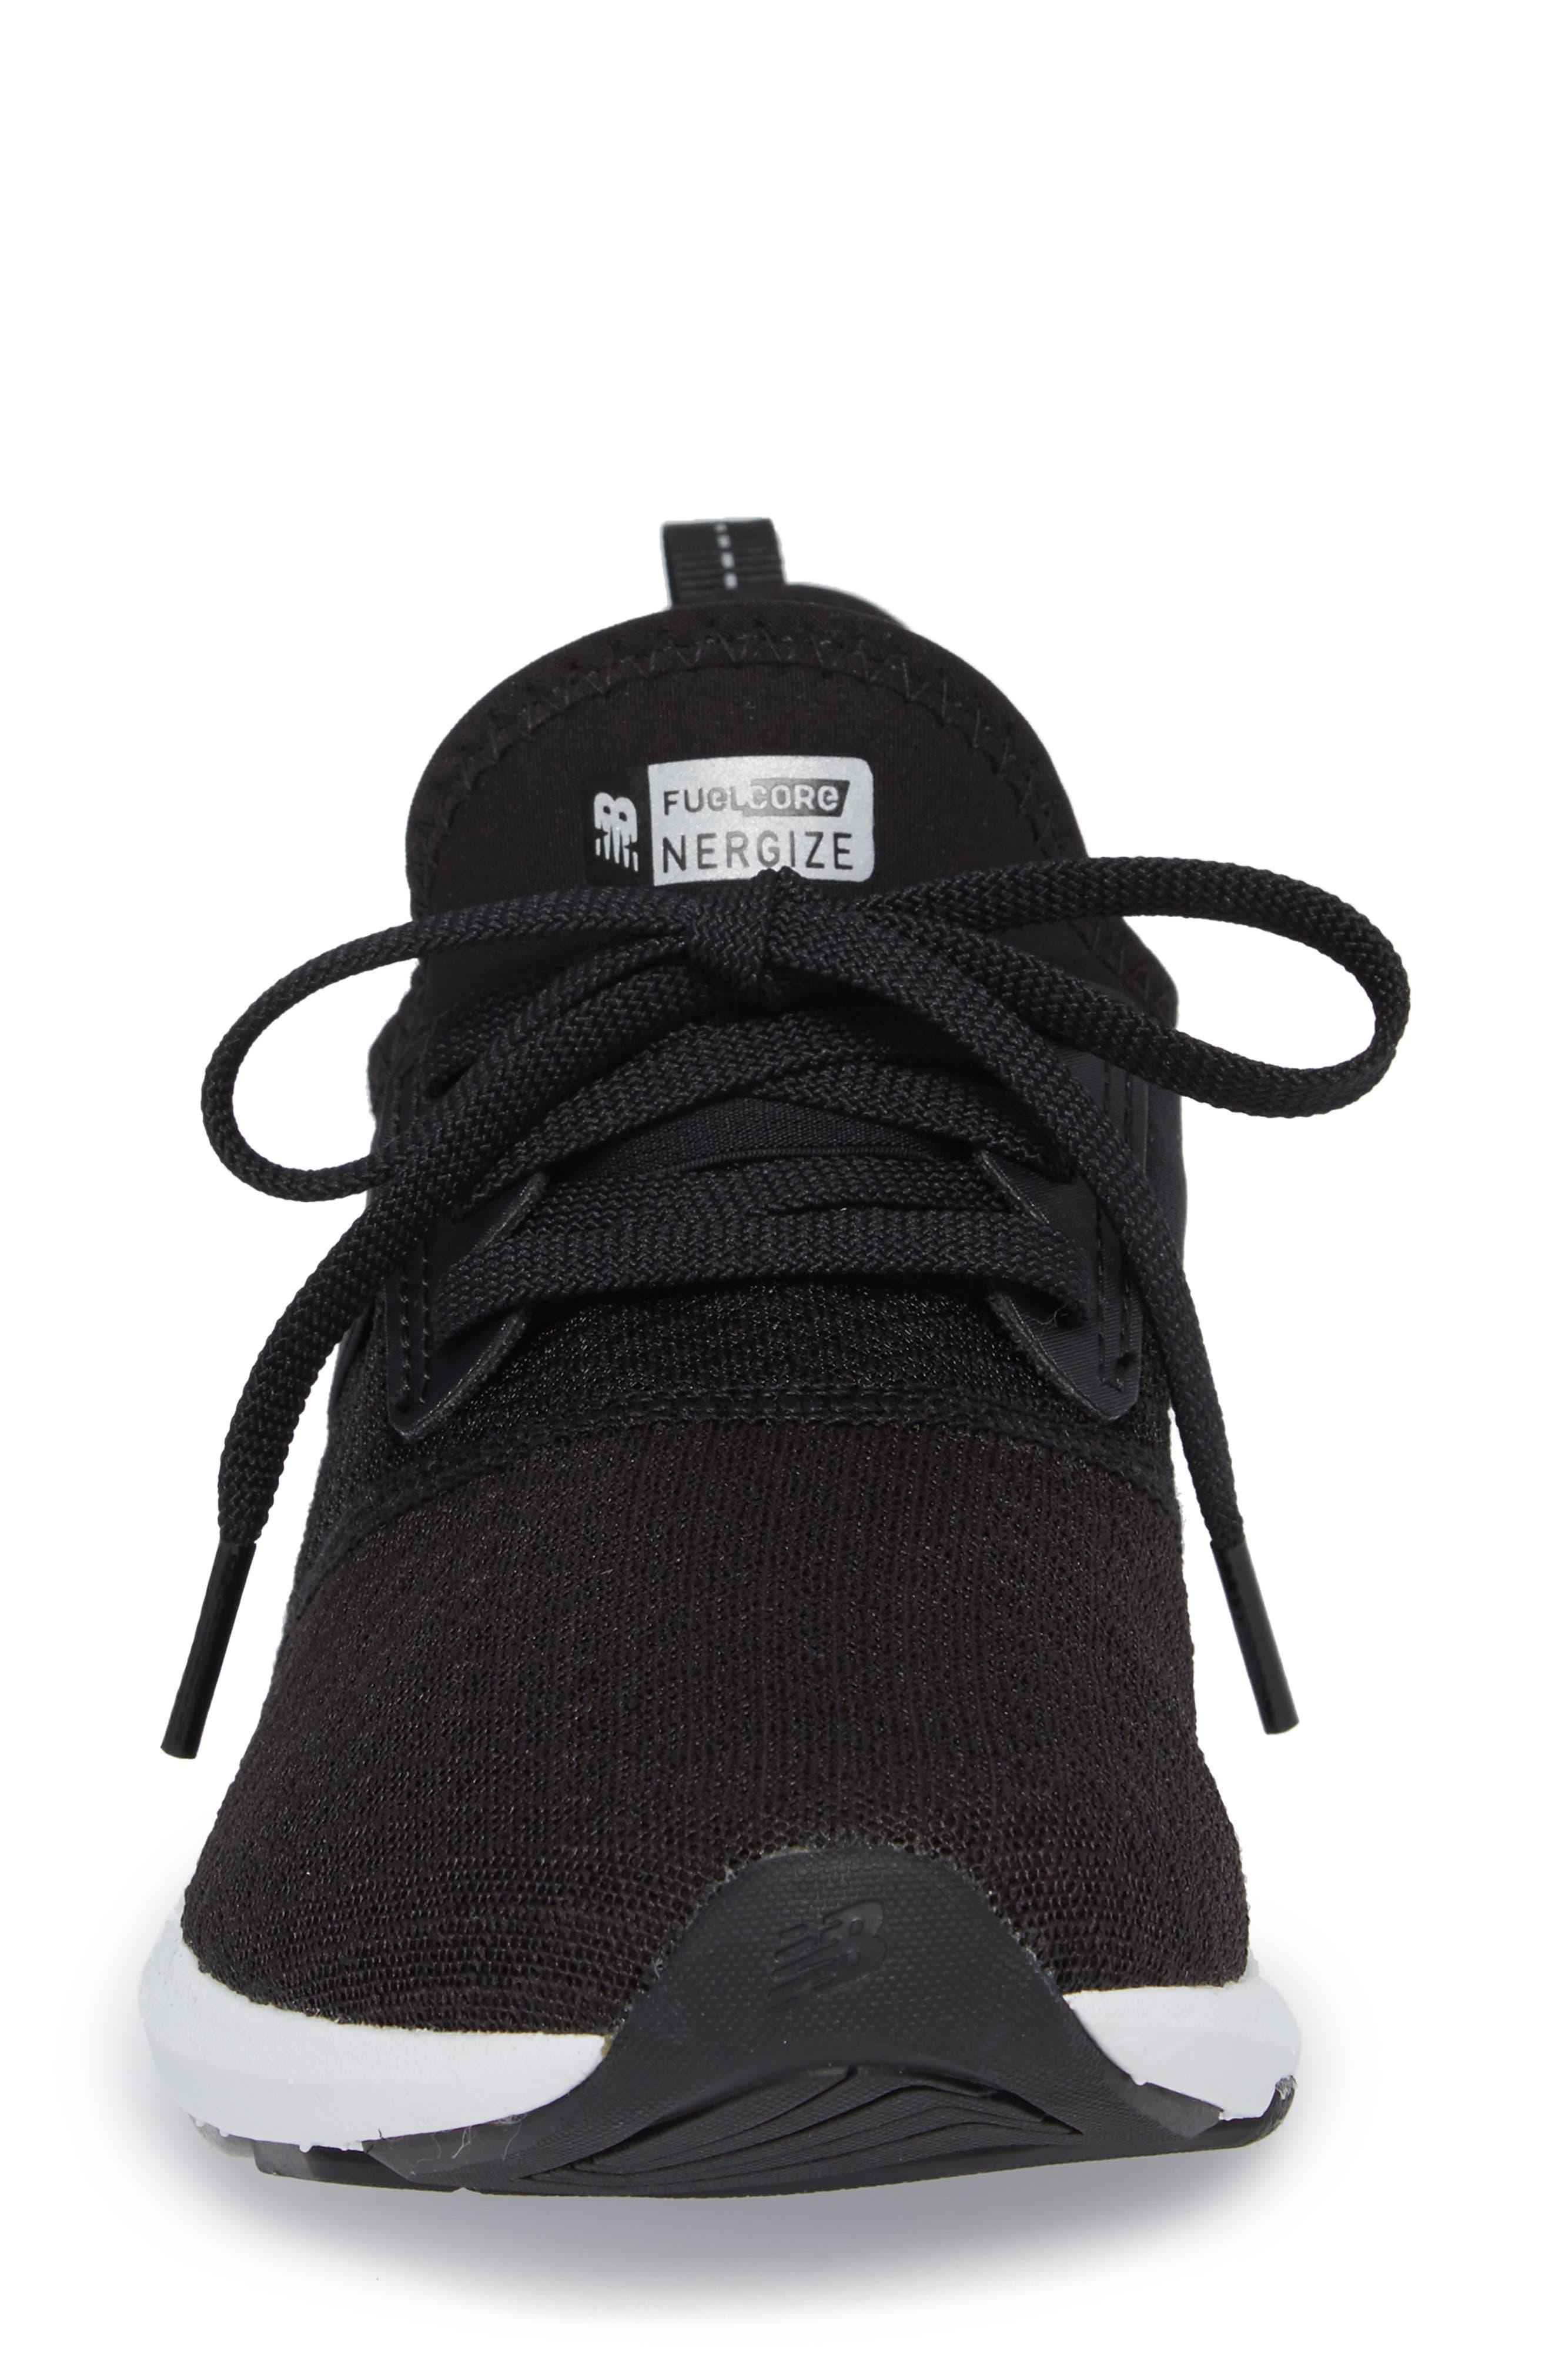 FuelCore NERGIZE Sneaker,                             Alternate thumbnail 4, color,                             BLACK